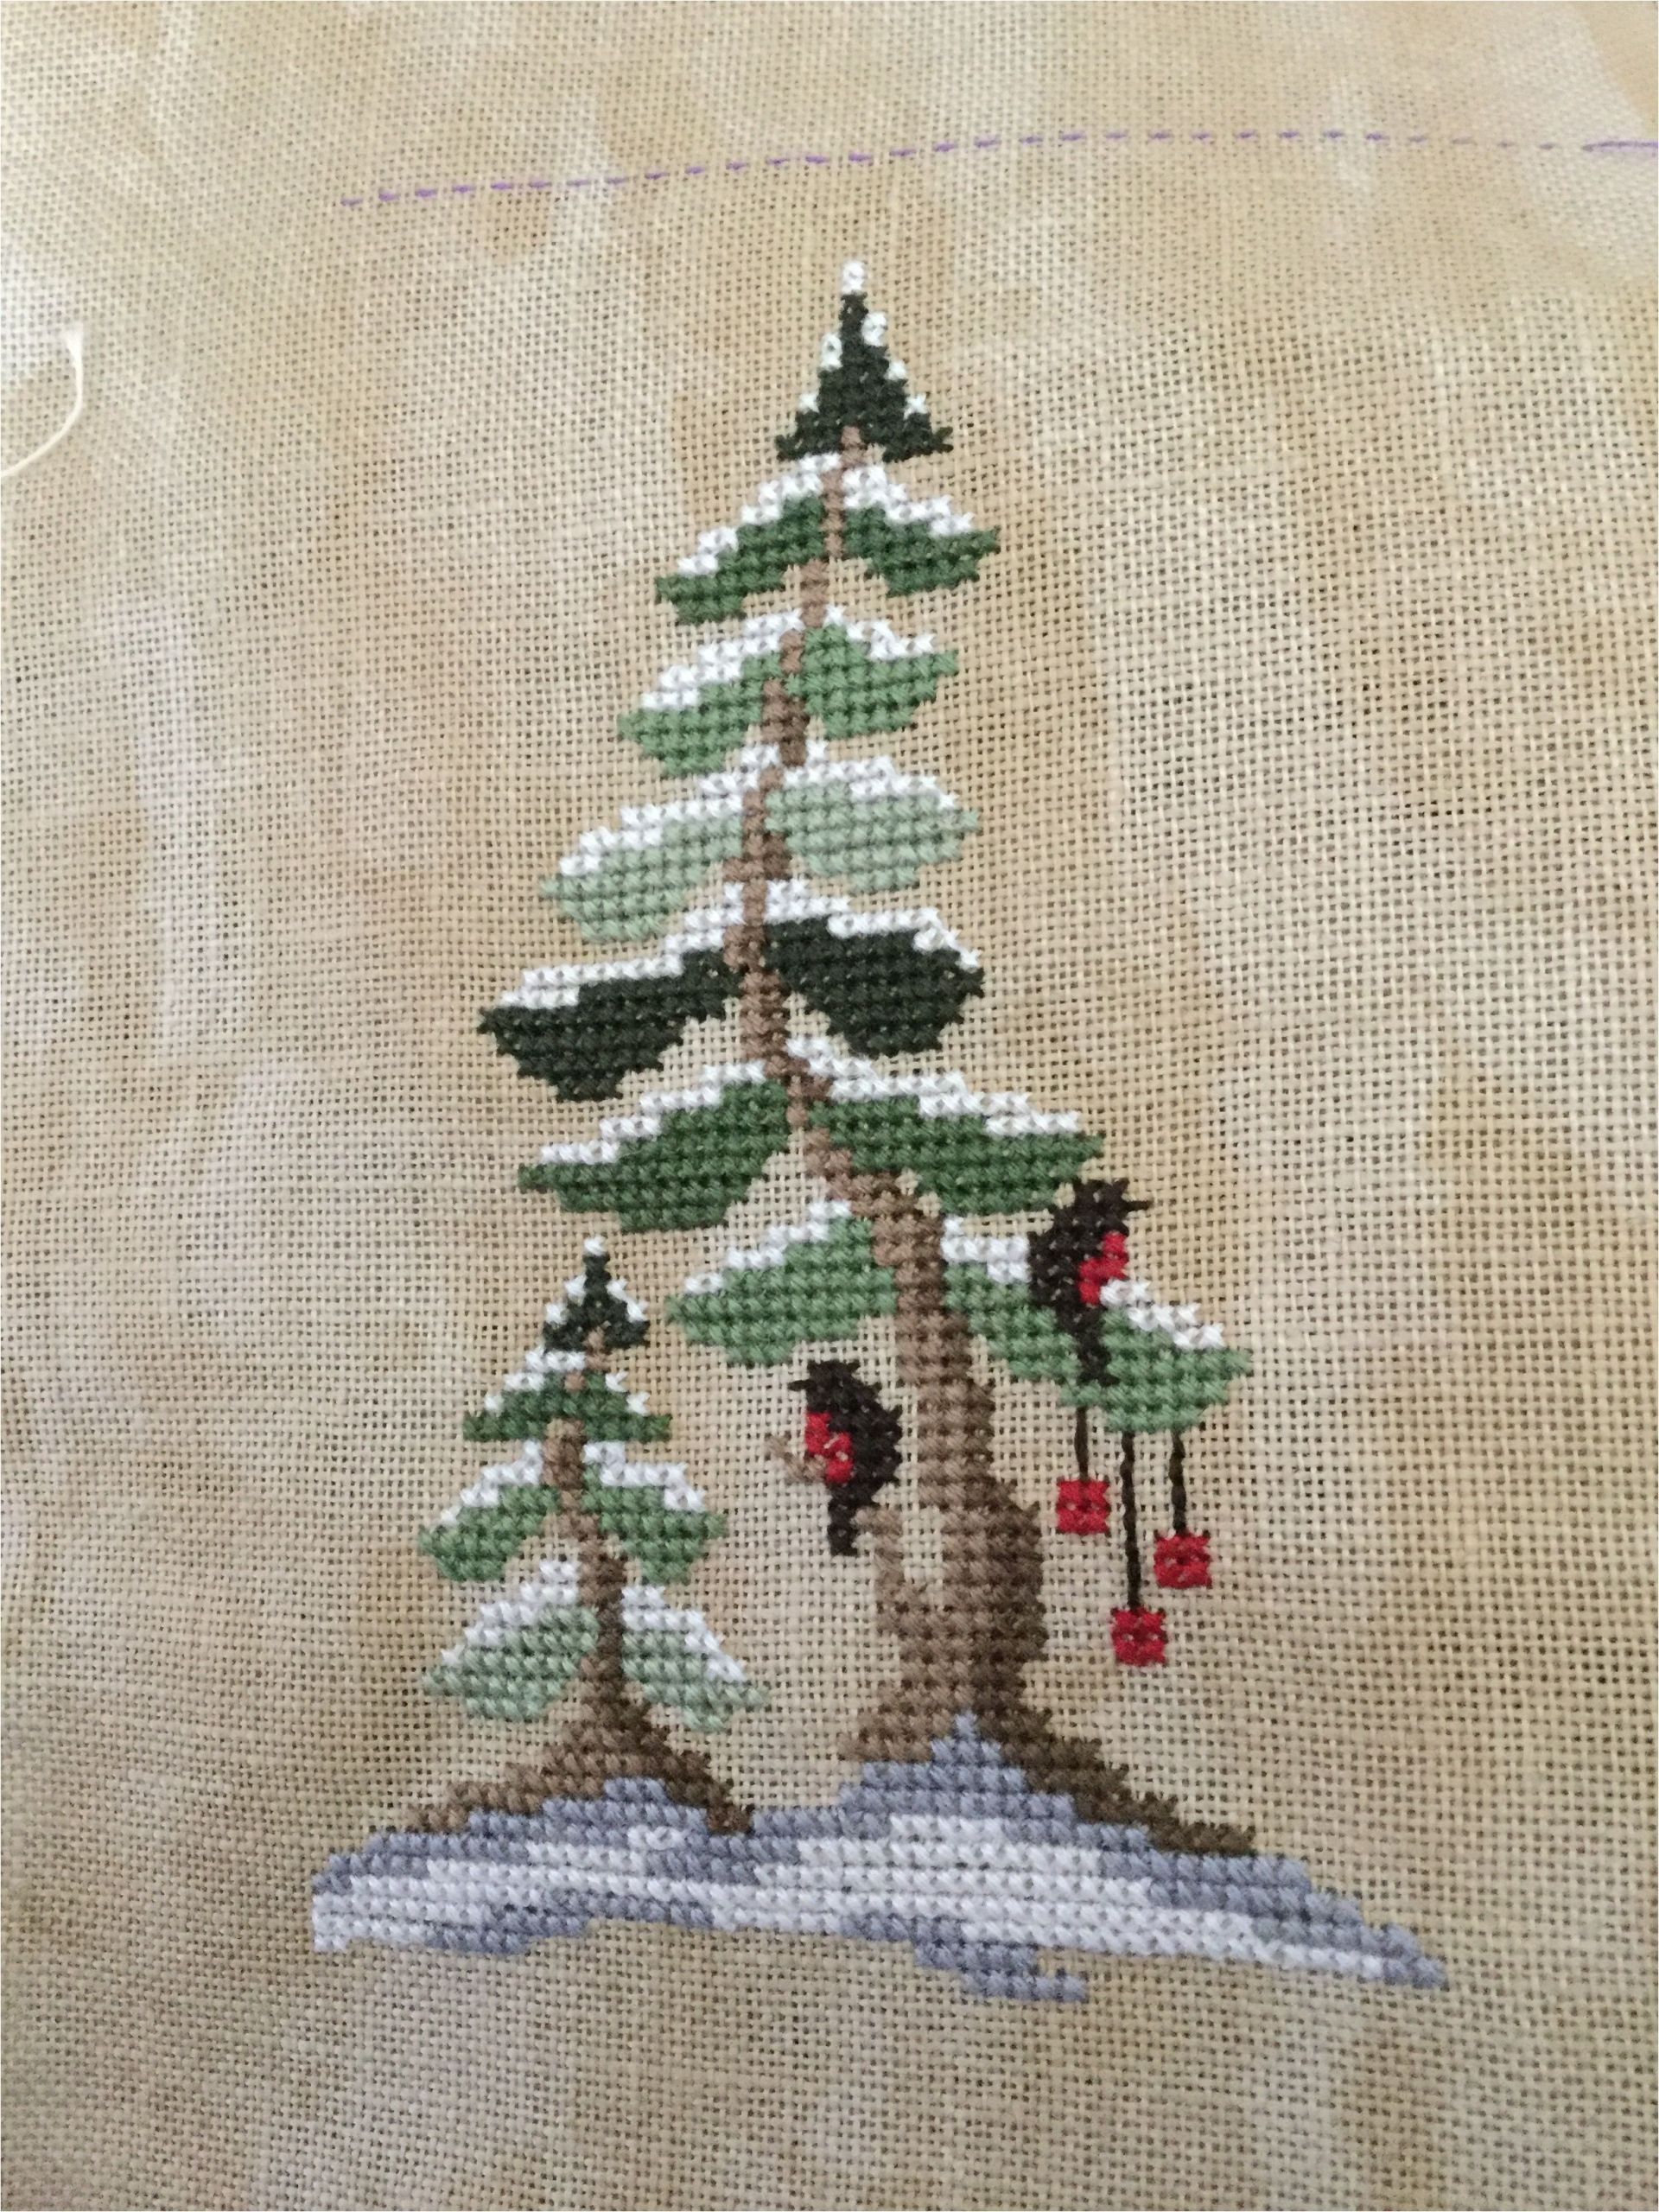 Christmas Card Cross Stitch Patterns Pin by Karen Chasteen On Christmas Cross Stitch Christmas